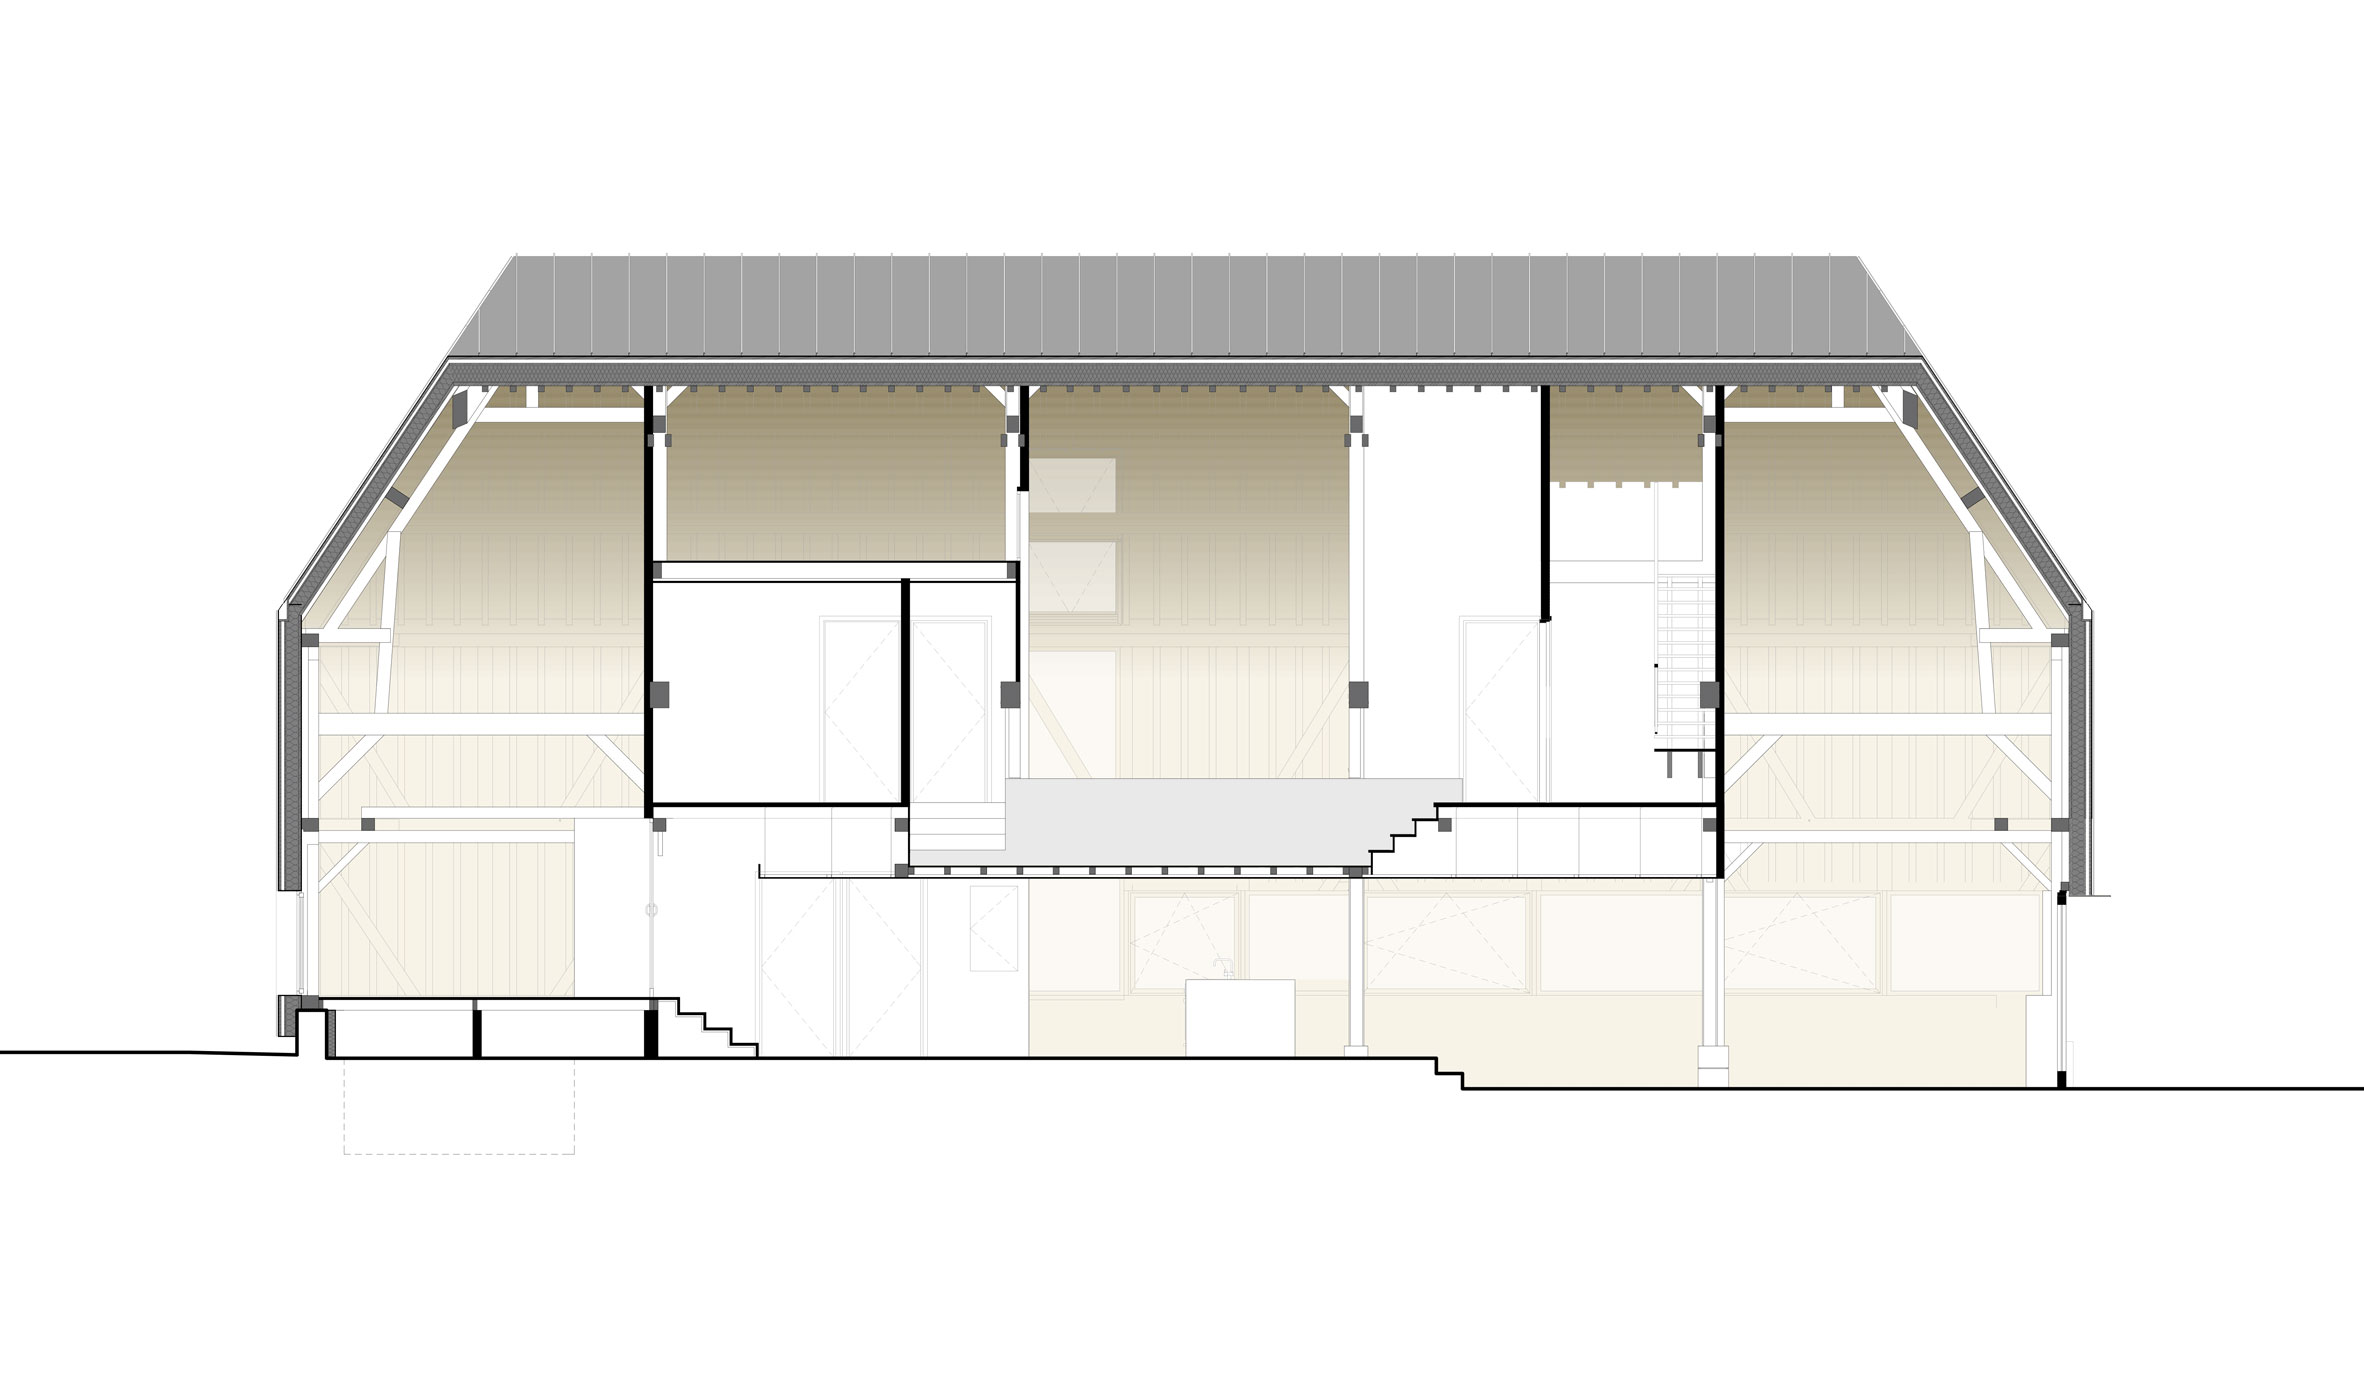 Architectural Studio Ziegler Converts an Abandoned Barn into a Private Home